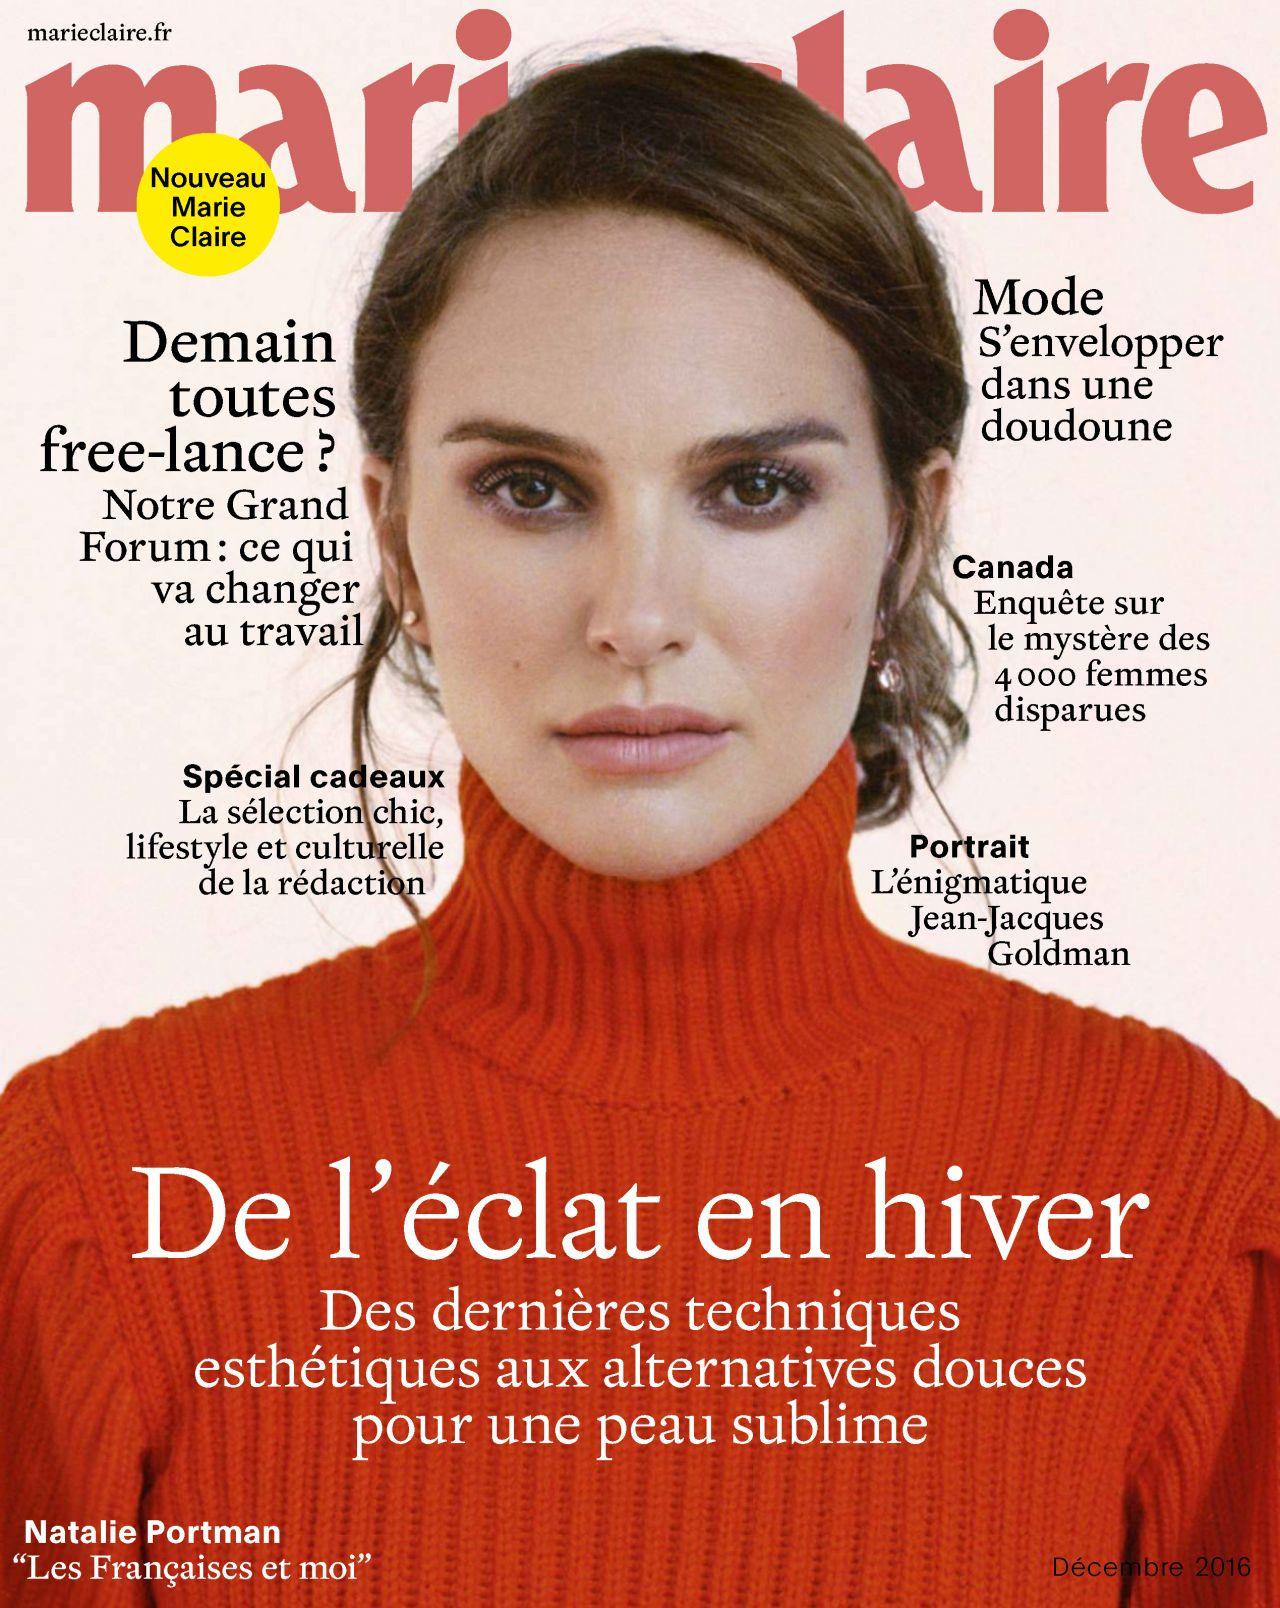 natalie portman marie claire magazine france december 2016 issue. Black Bedroom Furniture Sets. Home Design Ideas